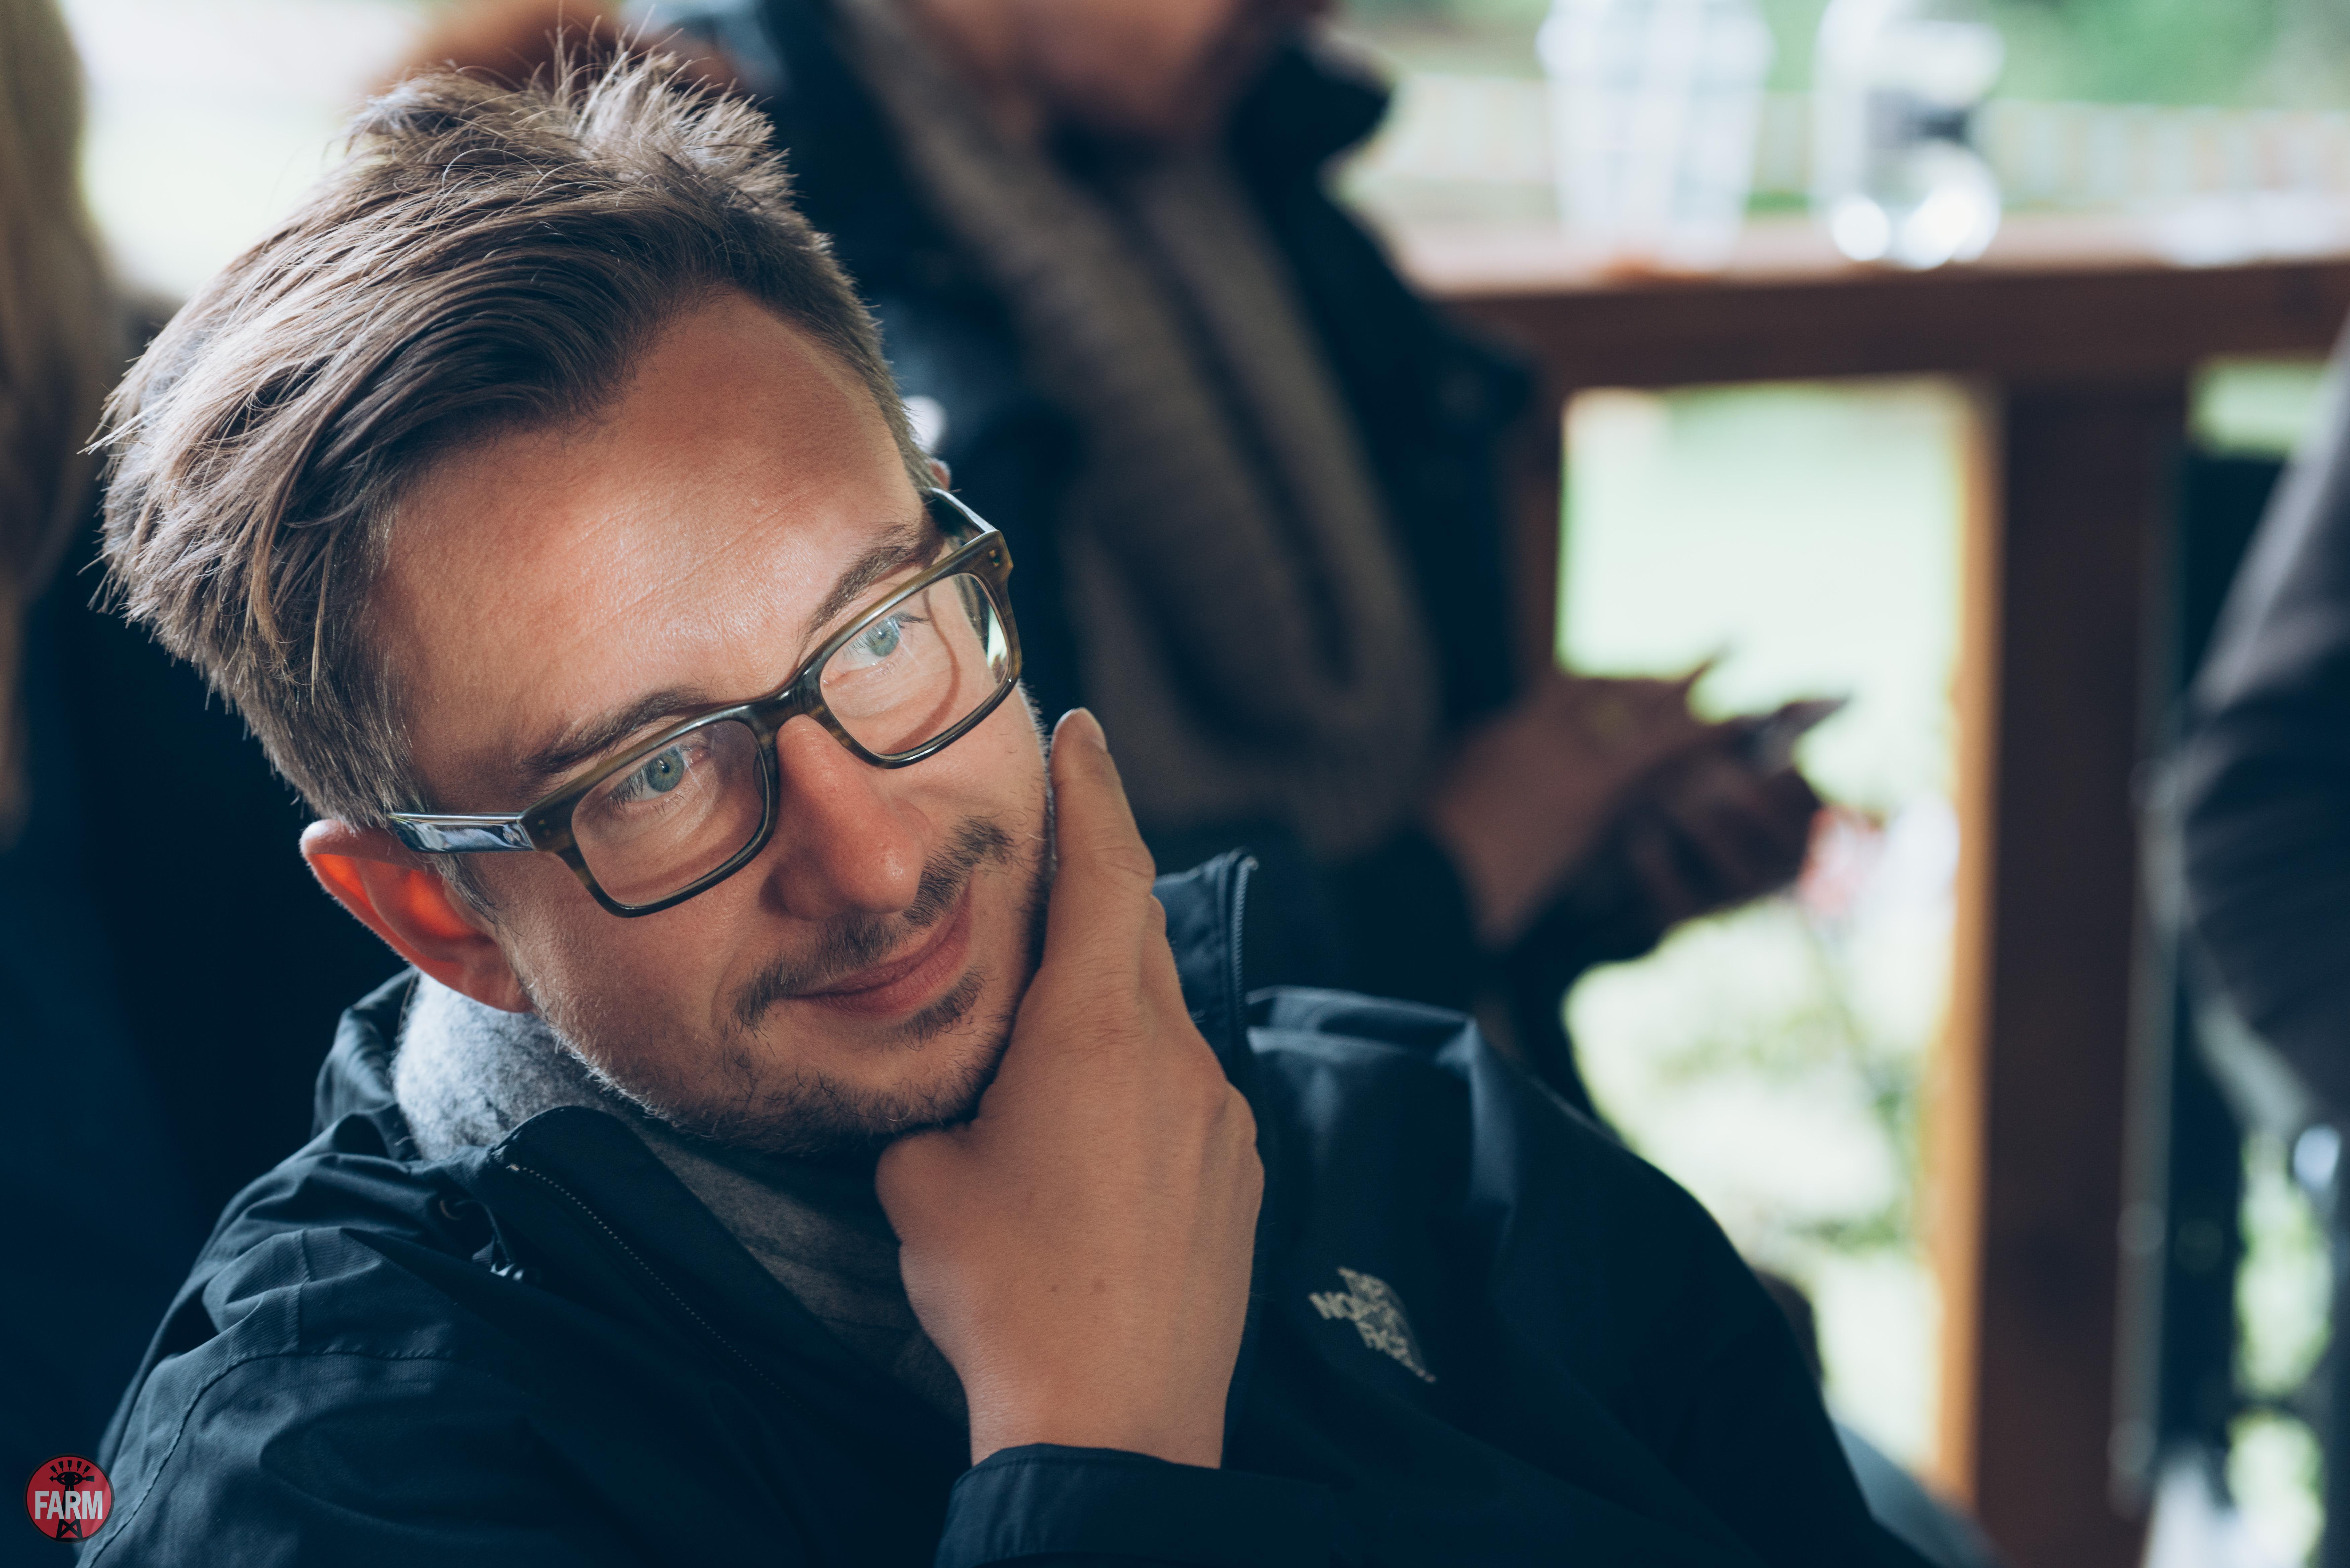 Director: Matthias Hoene